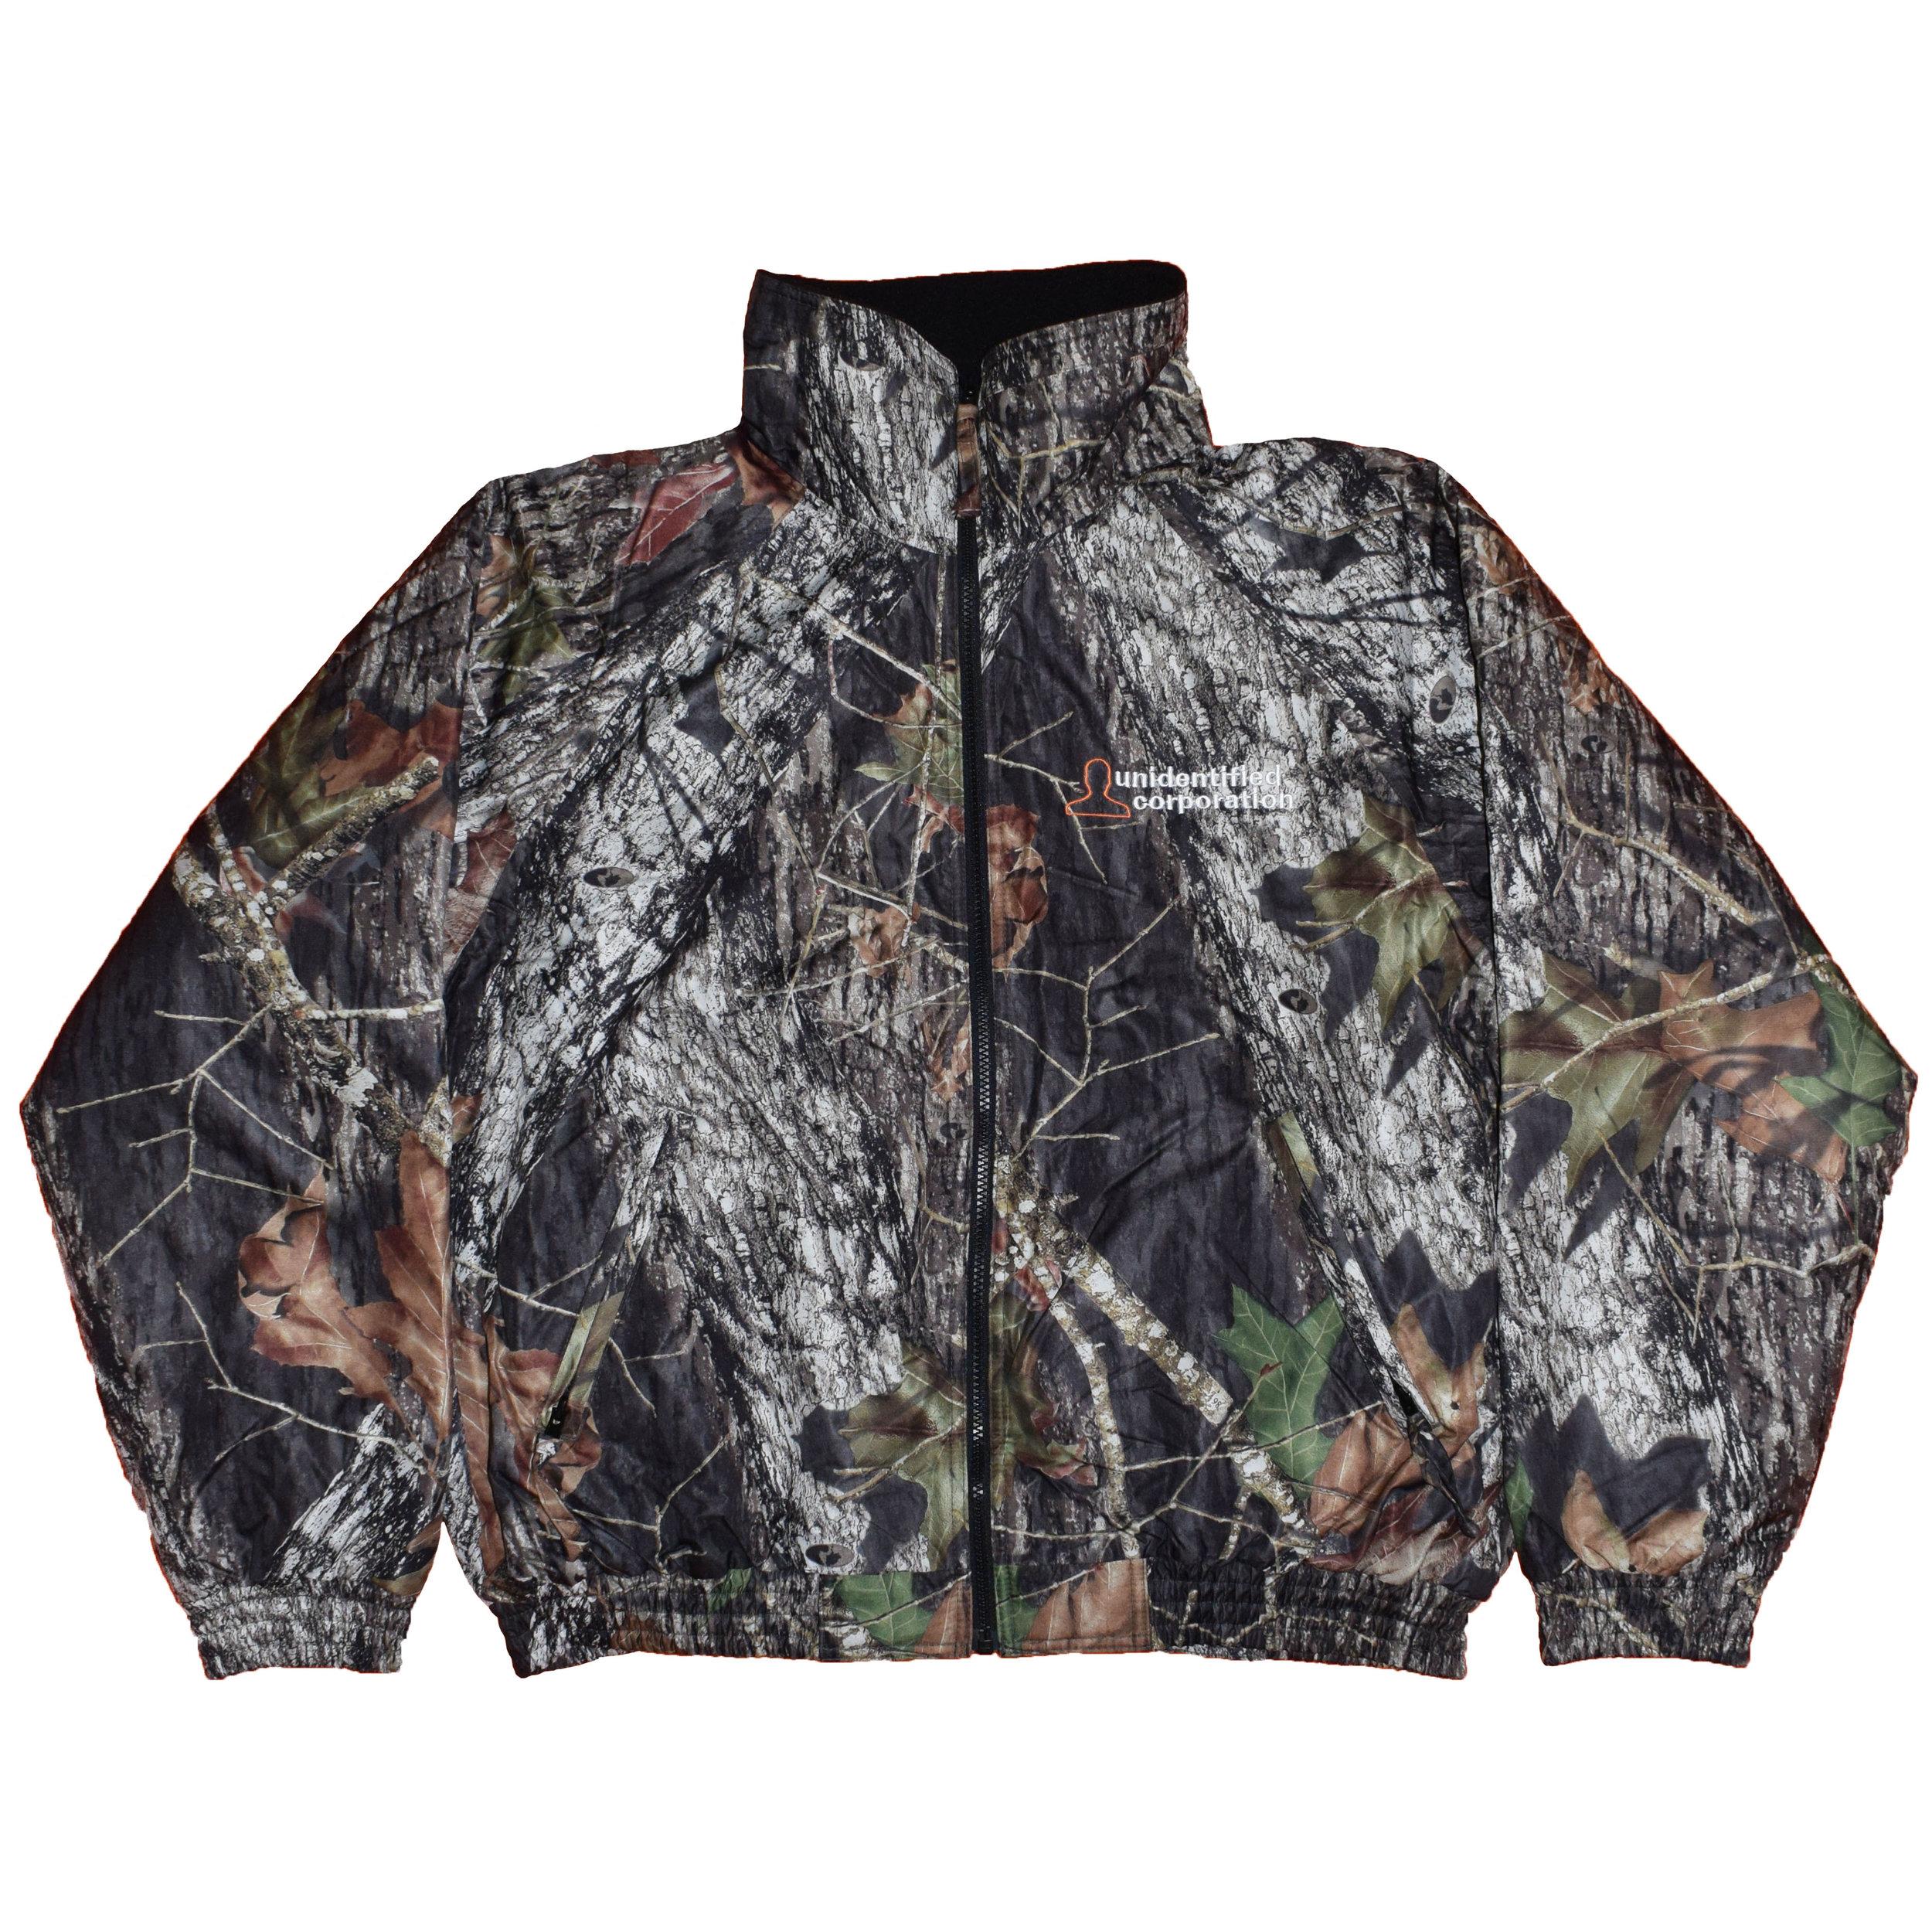 Camo Jacket 1 Square.jpg